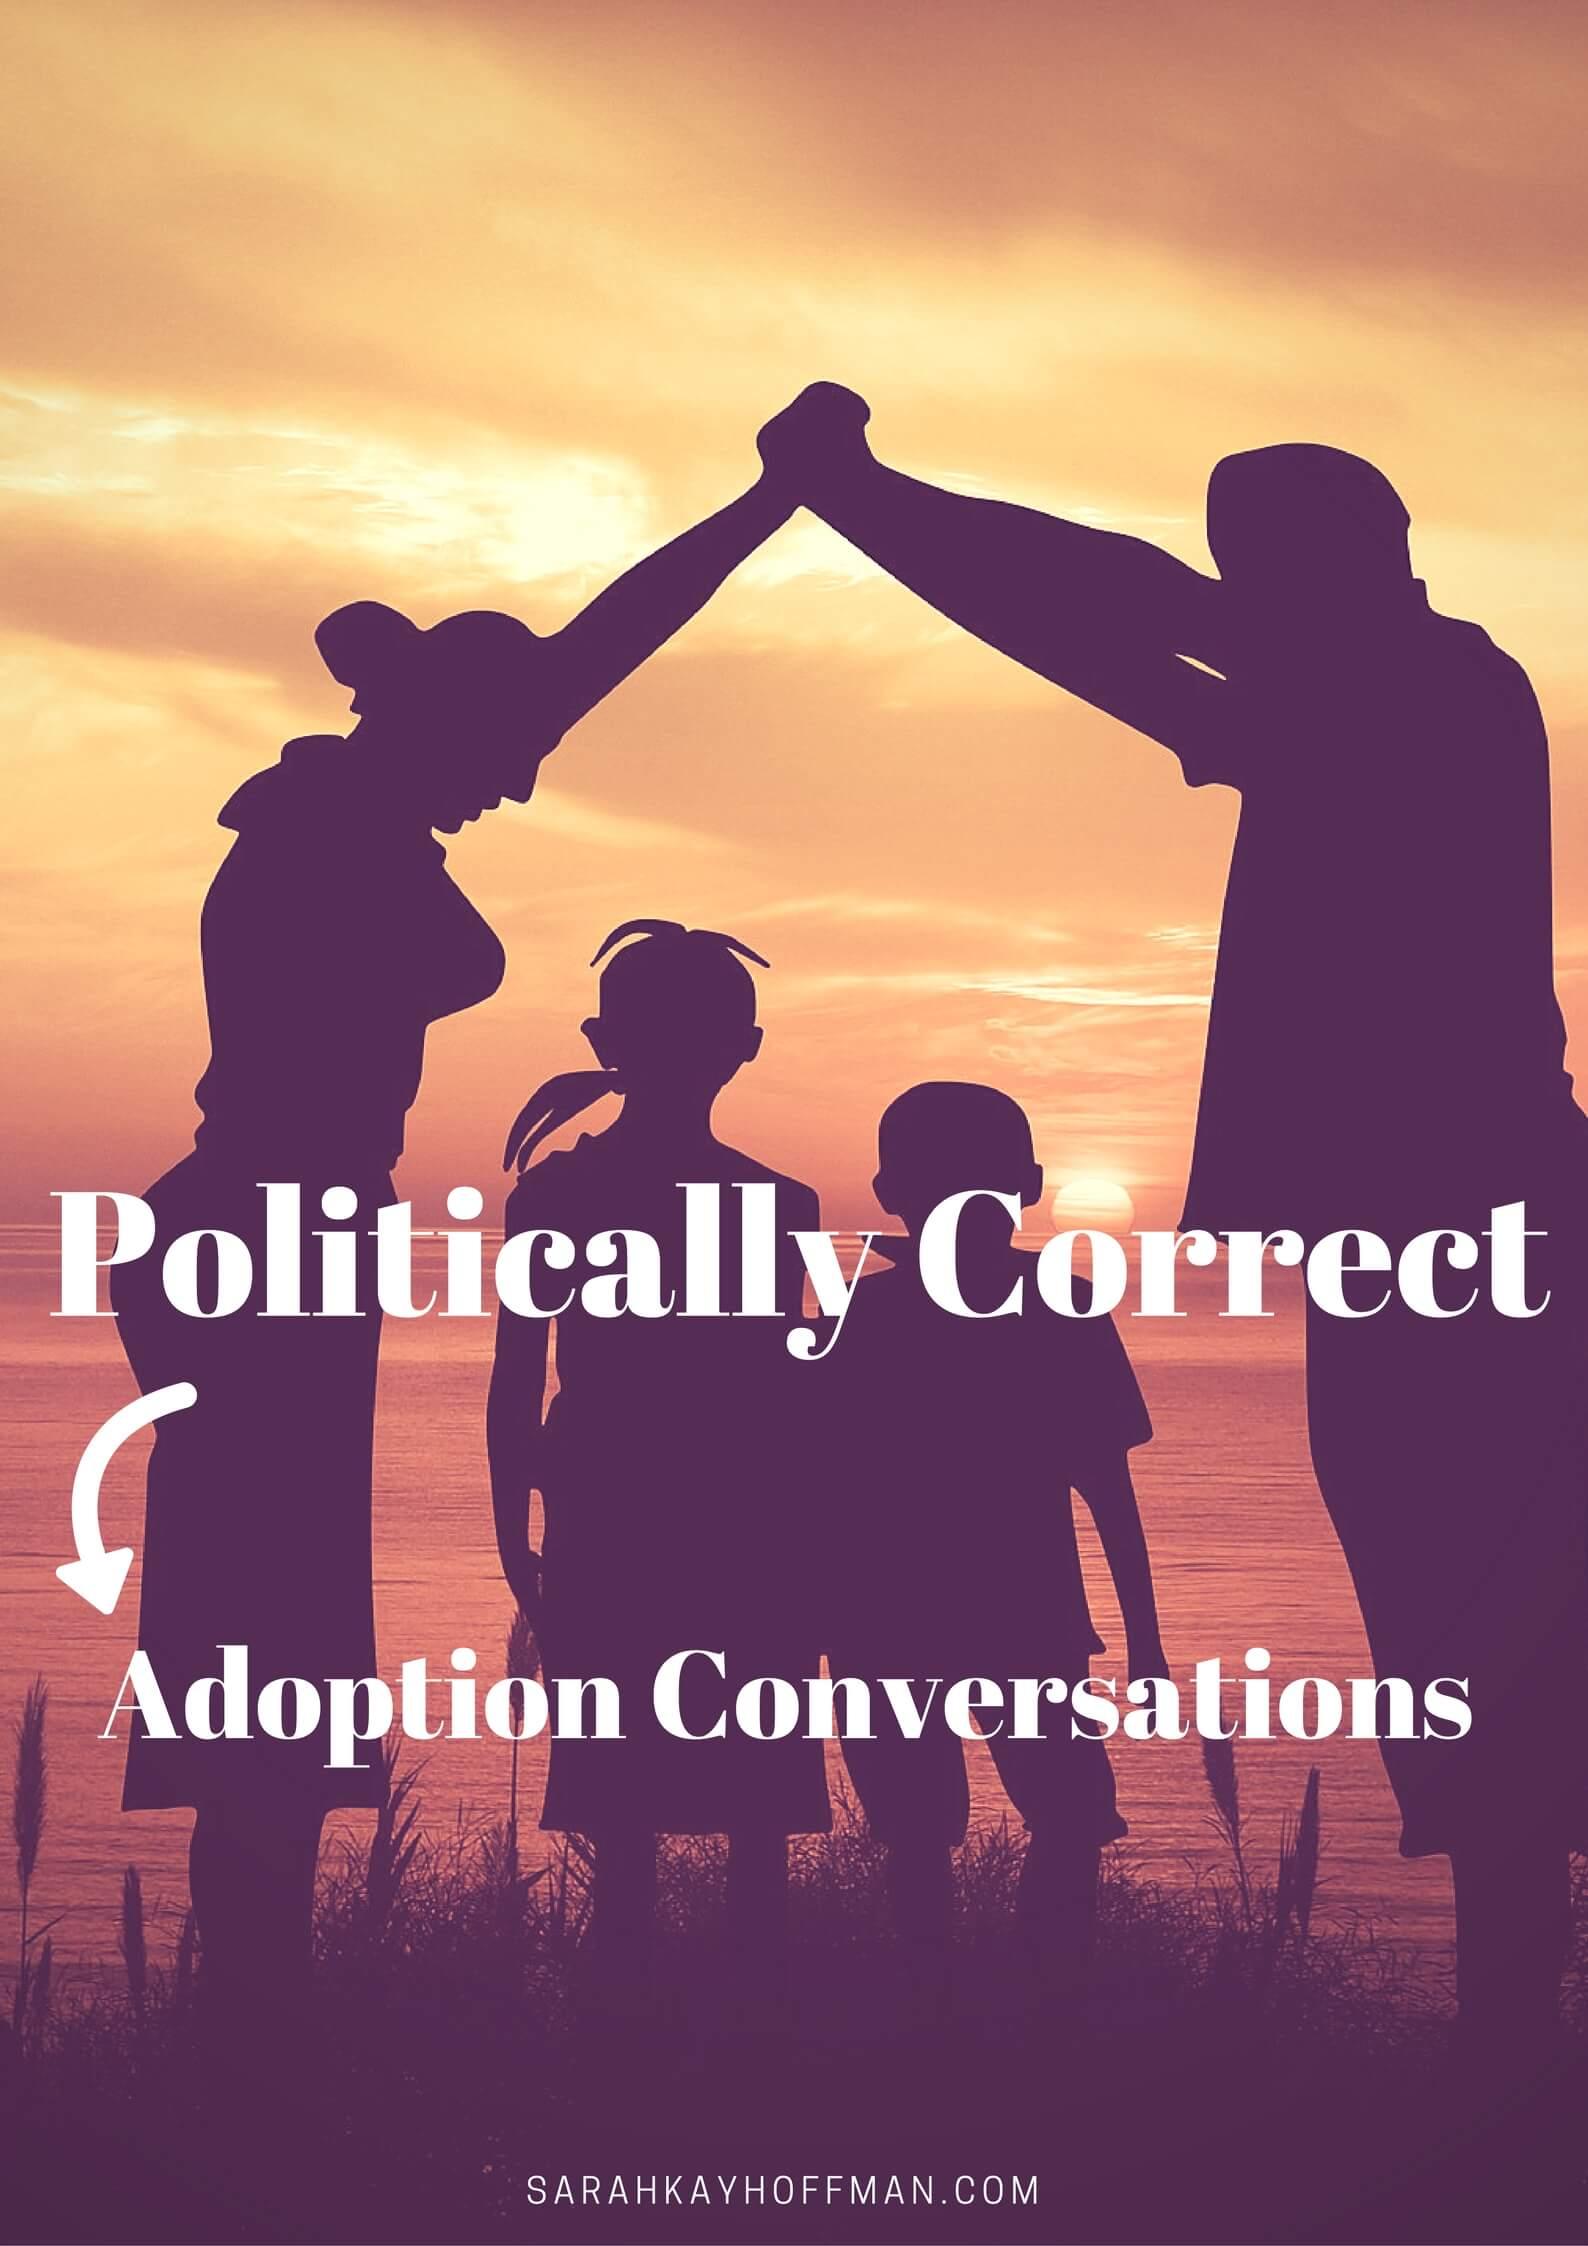 Politically Correct sarahkayhoffman.com Adoption Conversations Foster Adopt